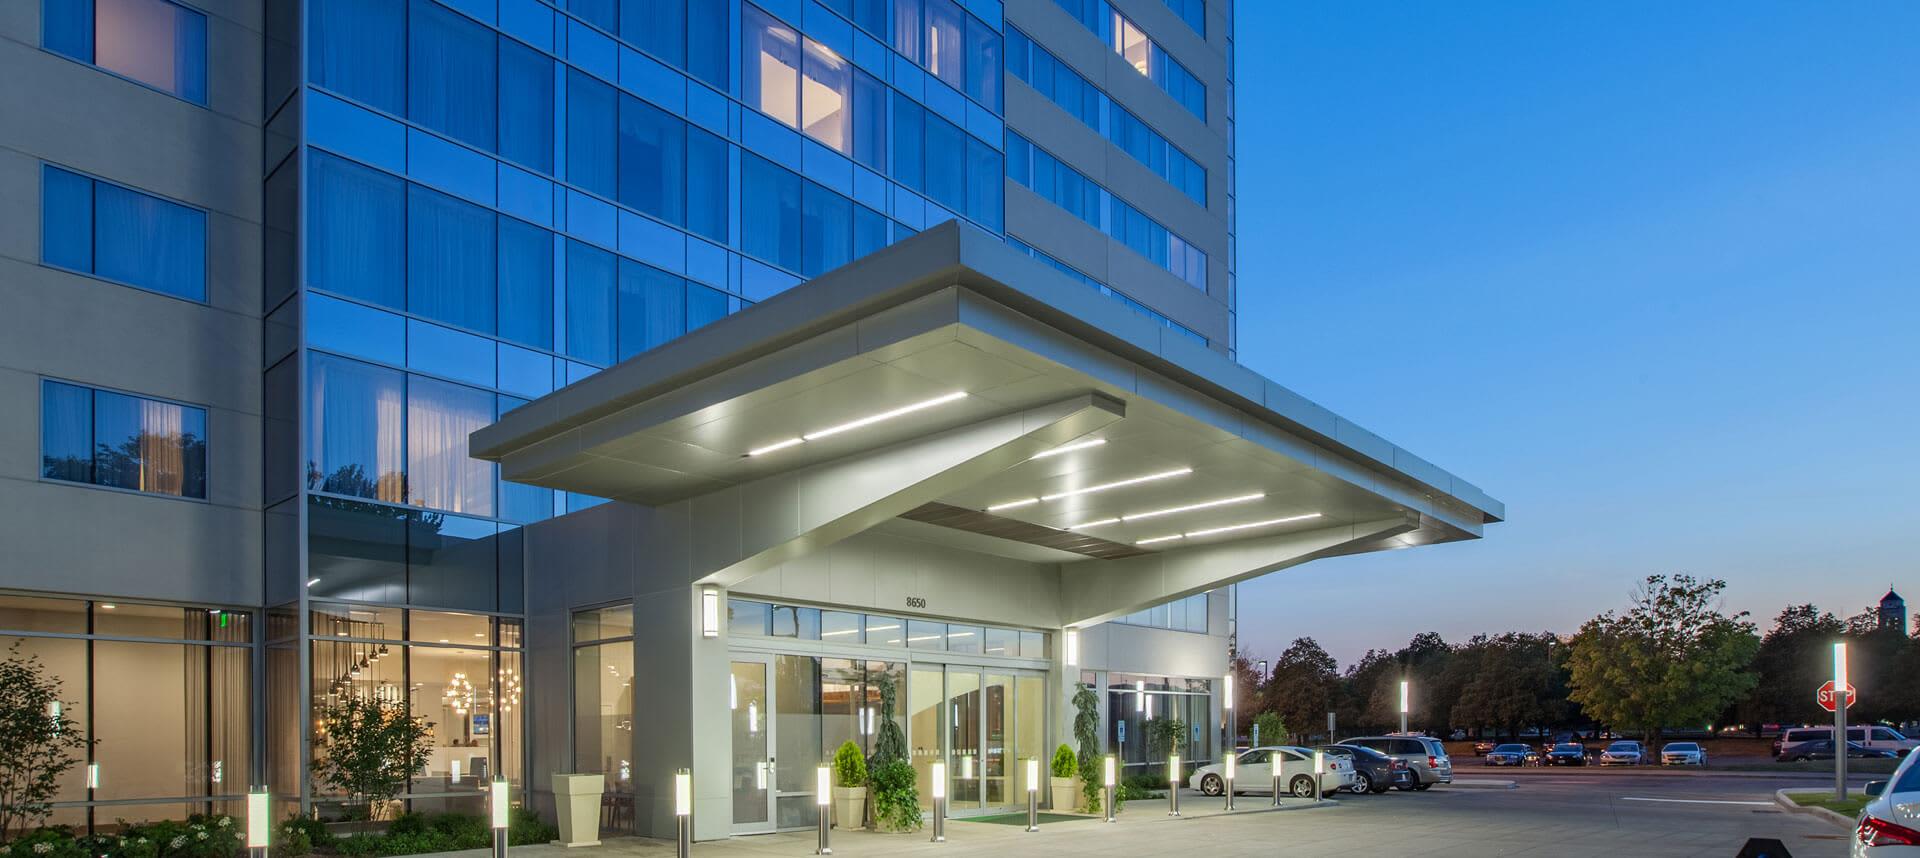 Holiday Inn Cleveland Clinic, Ohio Sitemap